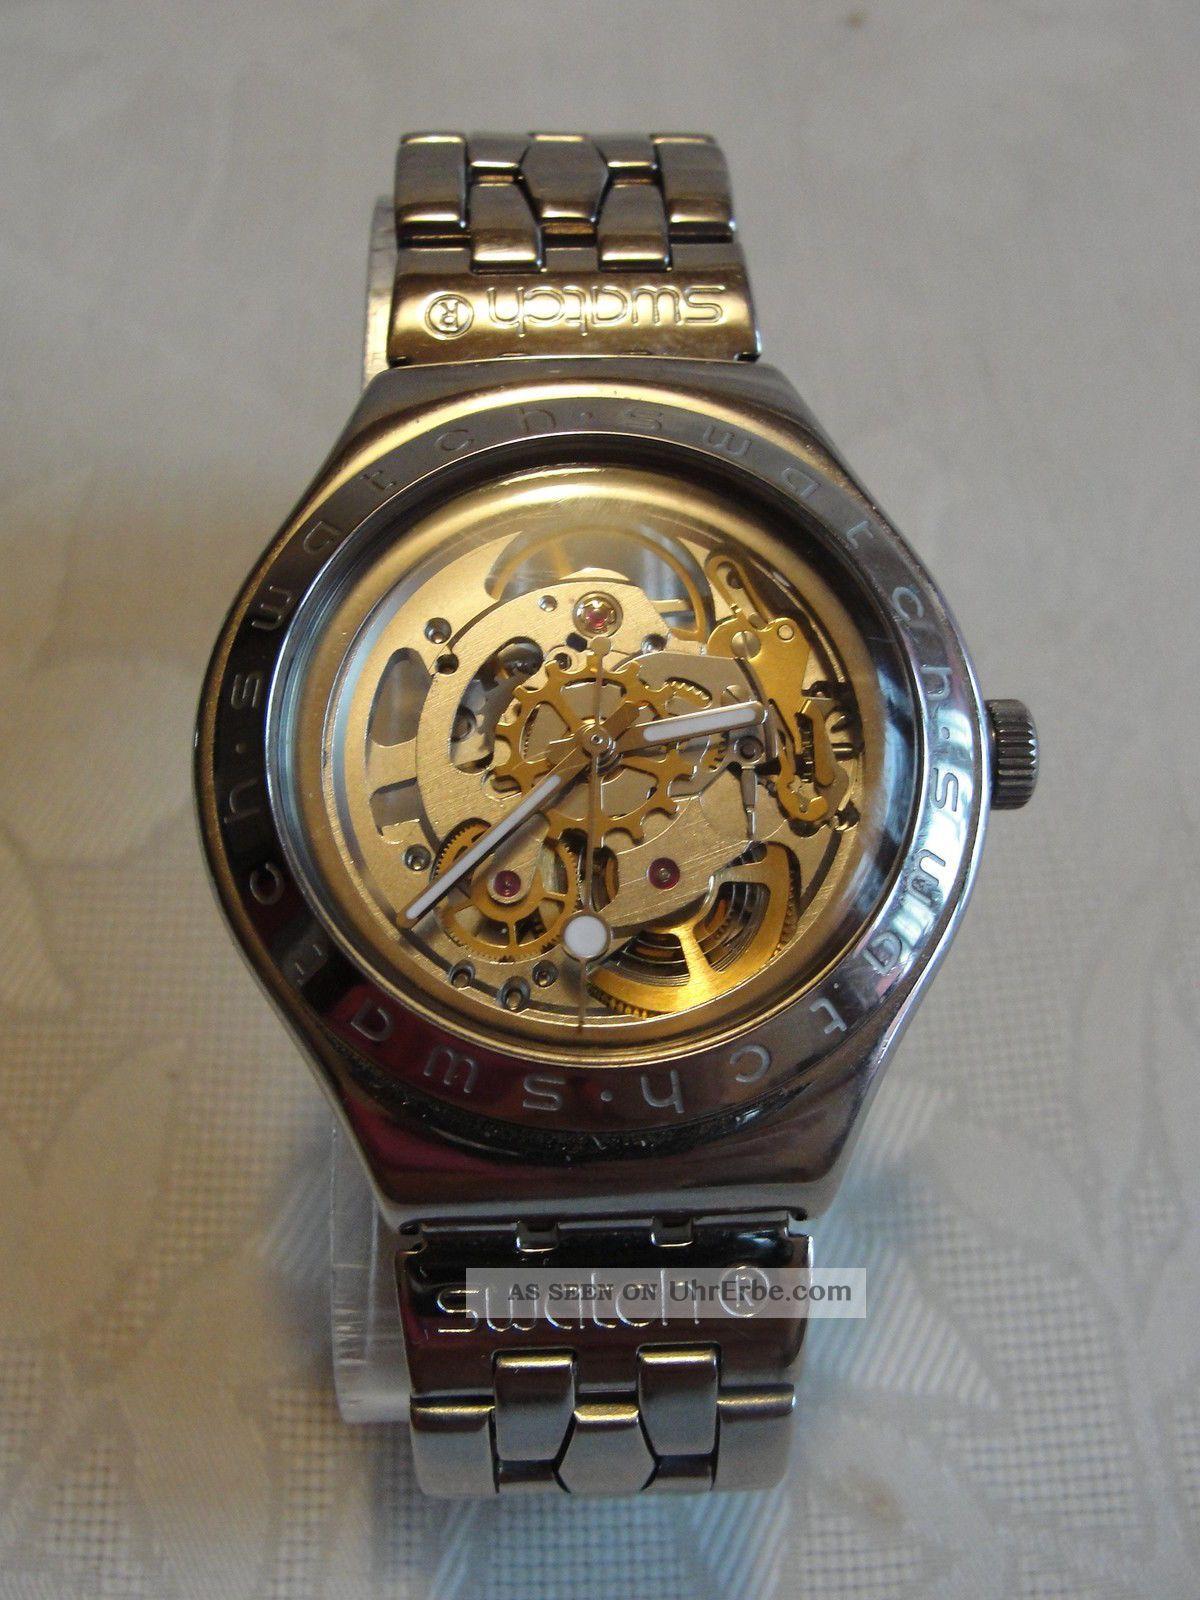 Swatch Irony Automatic Mit Eta 2841 - 1 Edelstahl Armbanduhren Bild